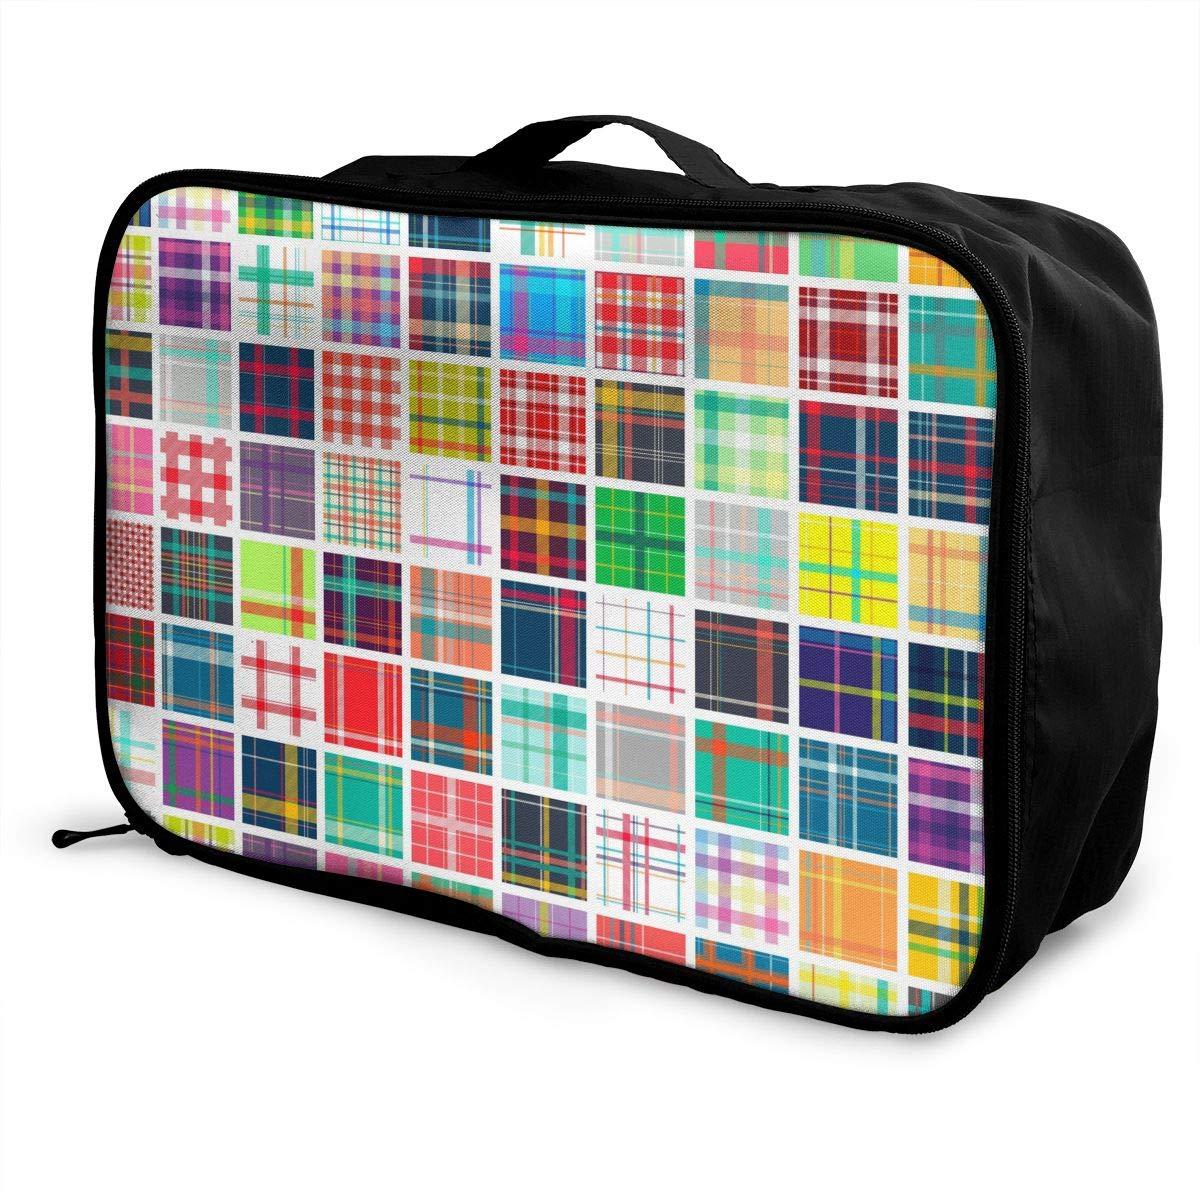 YueLJB Scotland Variety Tartan Lightweight Large Capacity Portable Luggage Bag Travel Duffel Bag Storage Carry Luggage Duffle Tote Bag